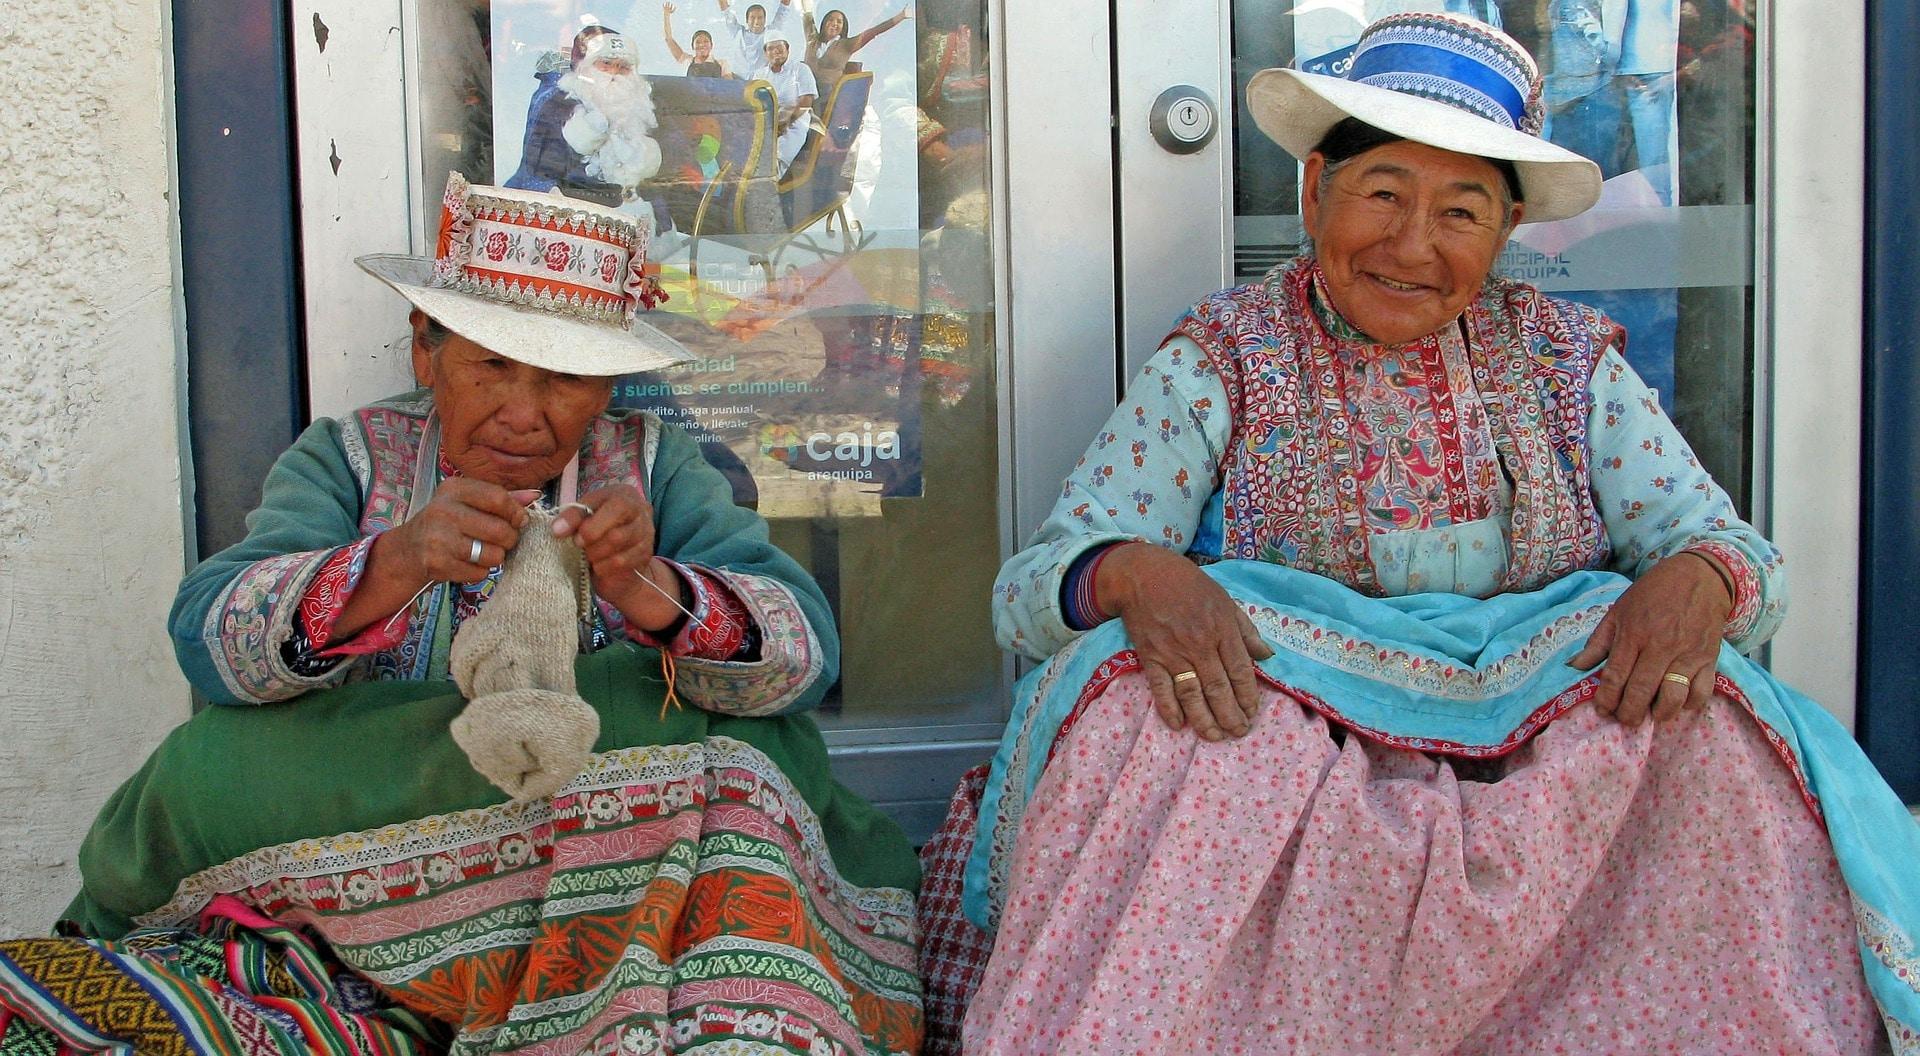 Perú vestimenta